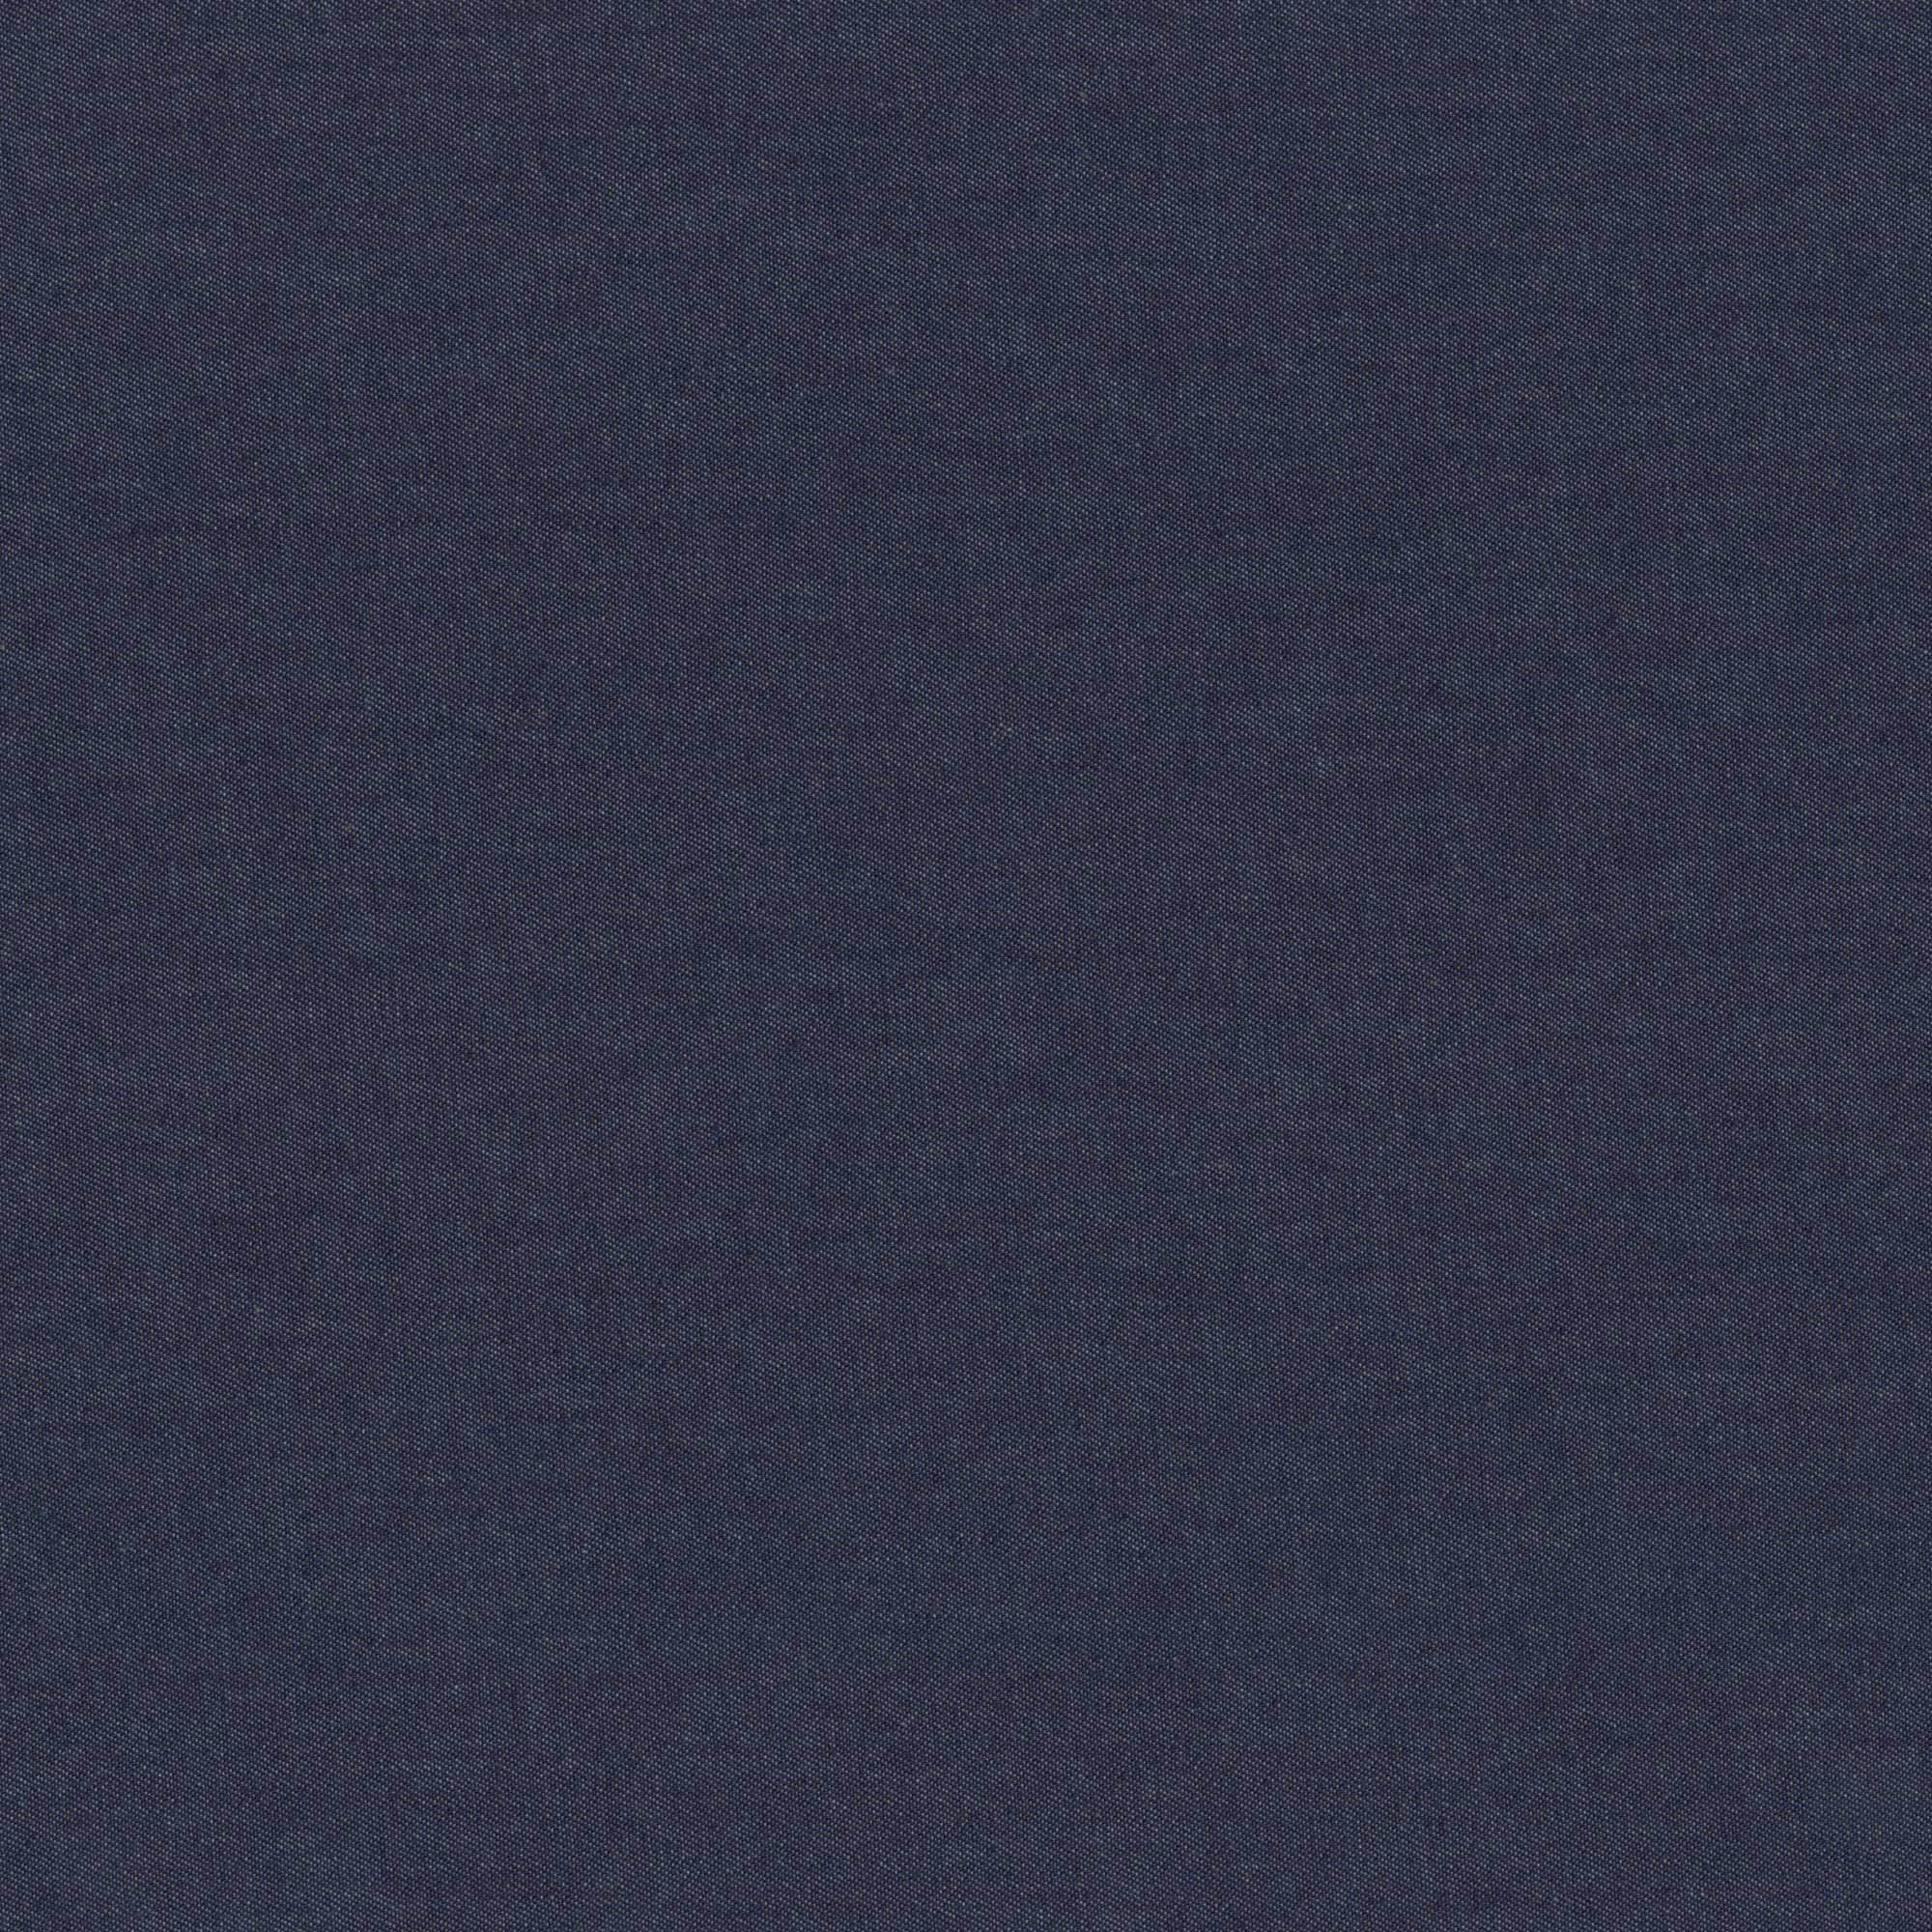 "David Textiles Indigo 6Oz Cotton Denim Fabric By The Yard - 56"" Wide"